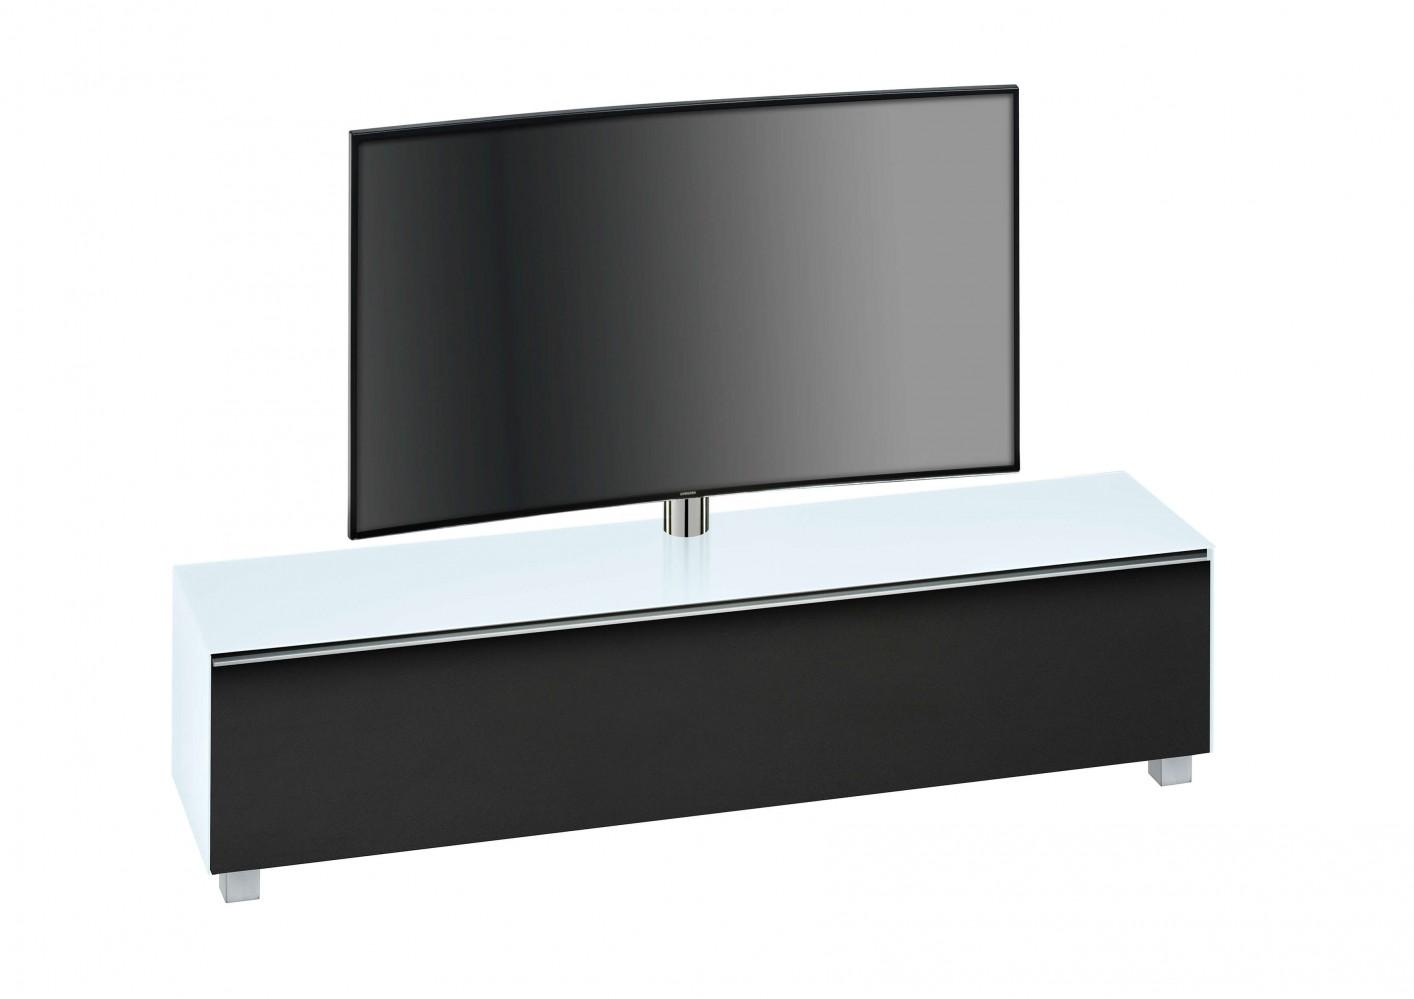 maja m bel soundboard 180 cm glas wei glas matt 7740 3673. Black Bedroom Furniture Sets. Home Design Ideas